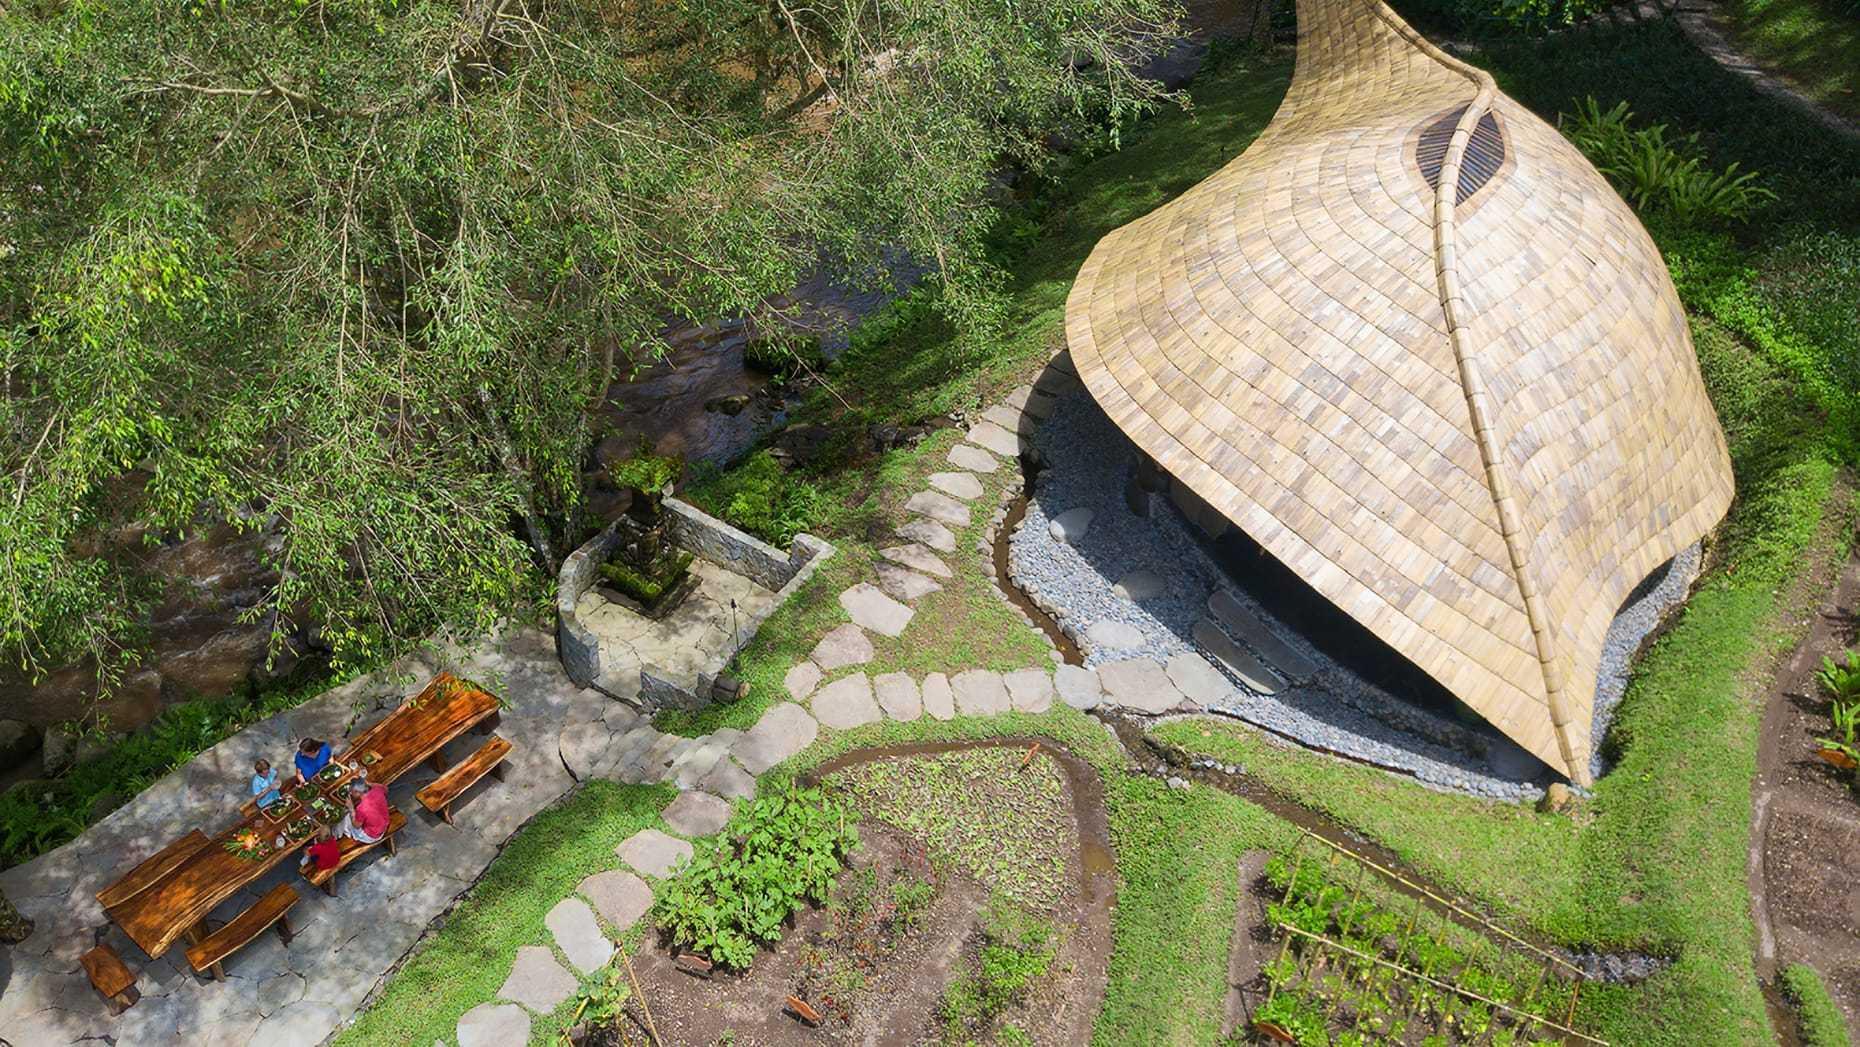 Agung Budi Raharsa | Architecture & Engineering Sokasi Bamboo Cooking Class / School - Bali Bali, Indonesia Bali, Indonesia Elevation  88746